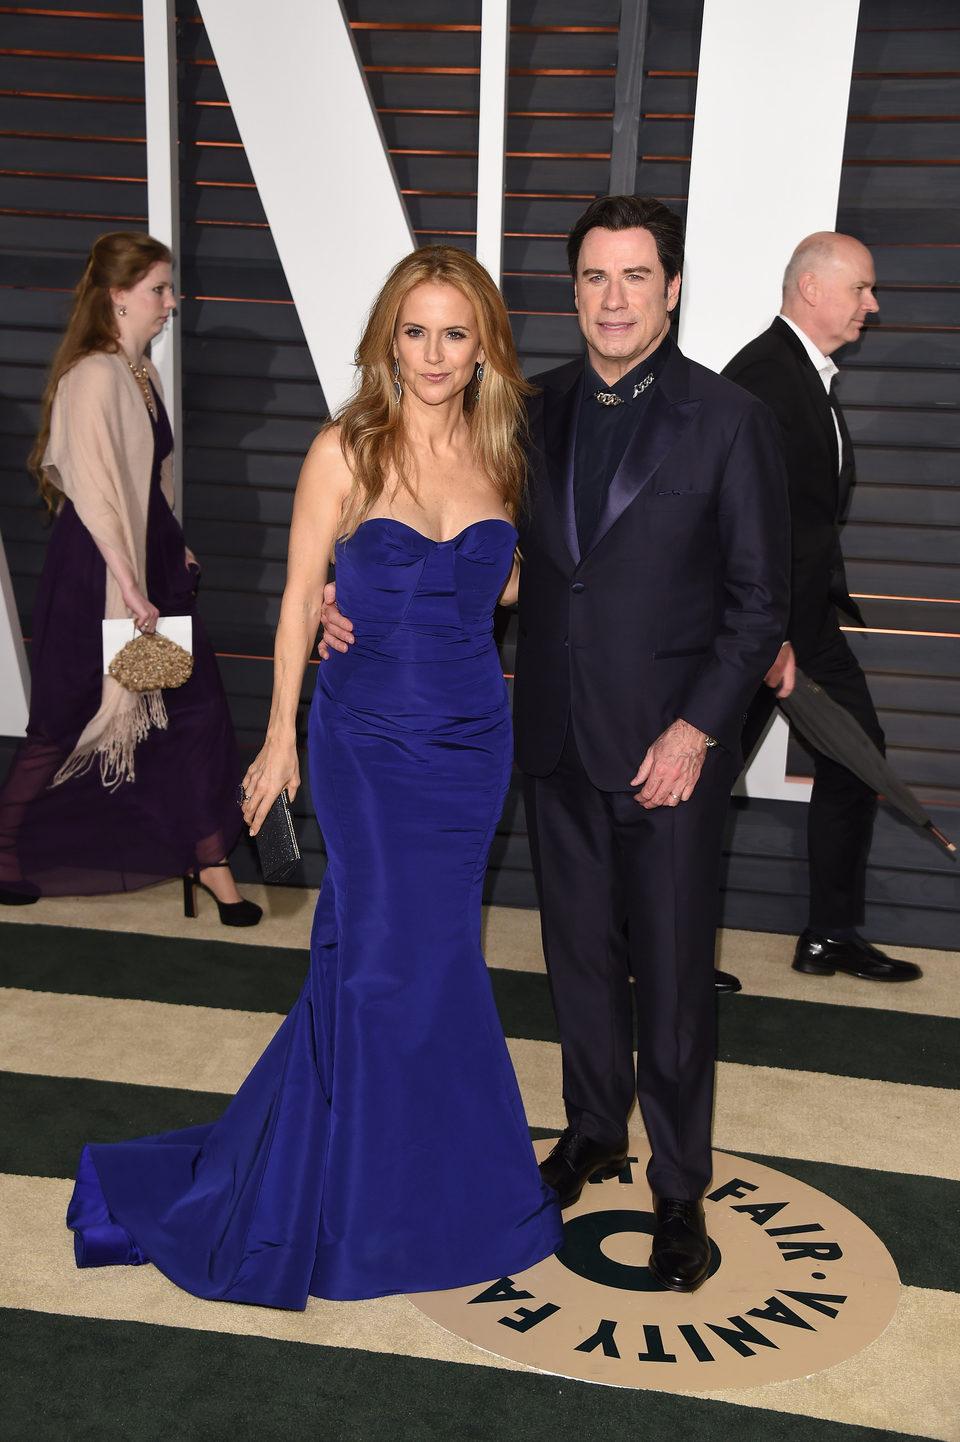 John Travolta and Kelly Preston in the Oscar 2015 red carpet